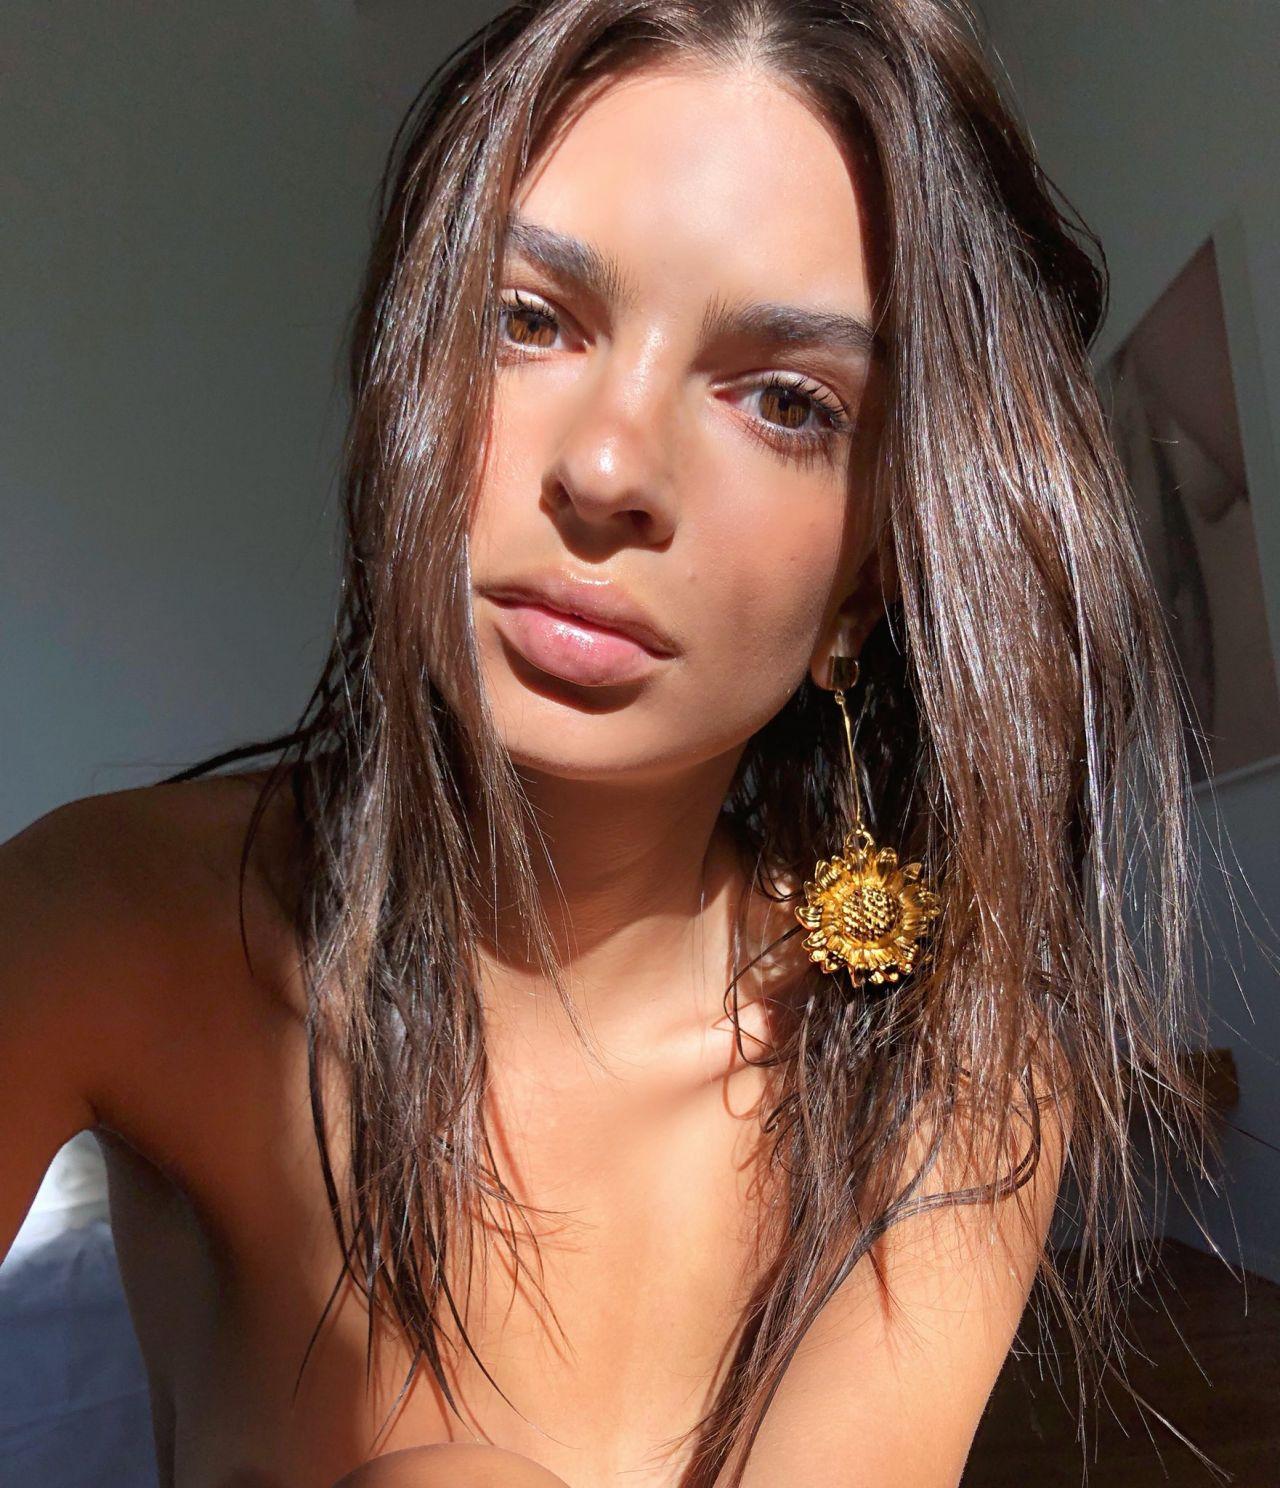 Emily Ratajkowski - Personal Pics 10/09/2018 • CelebMafia